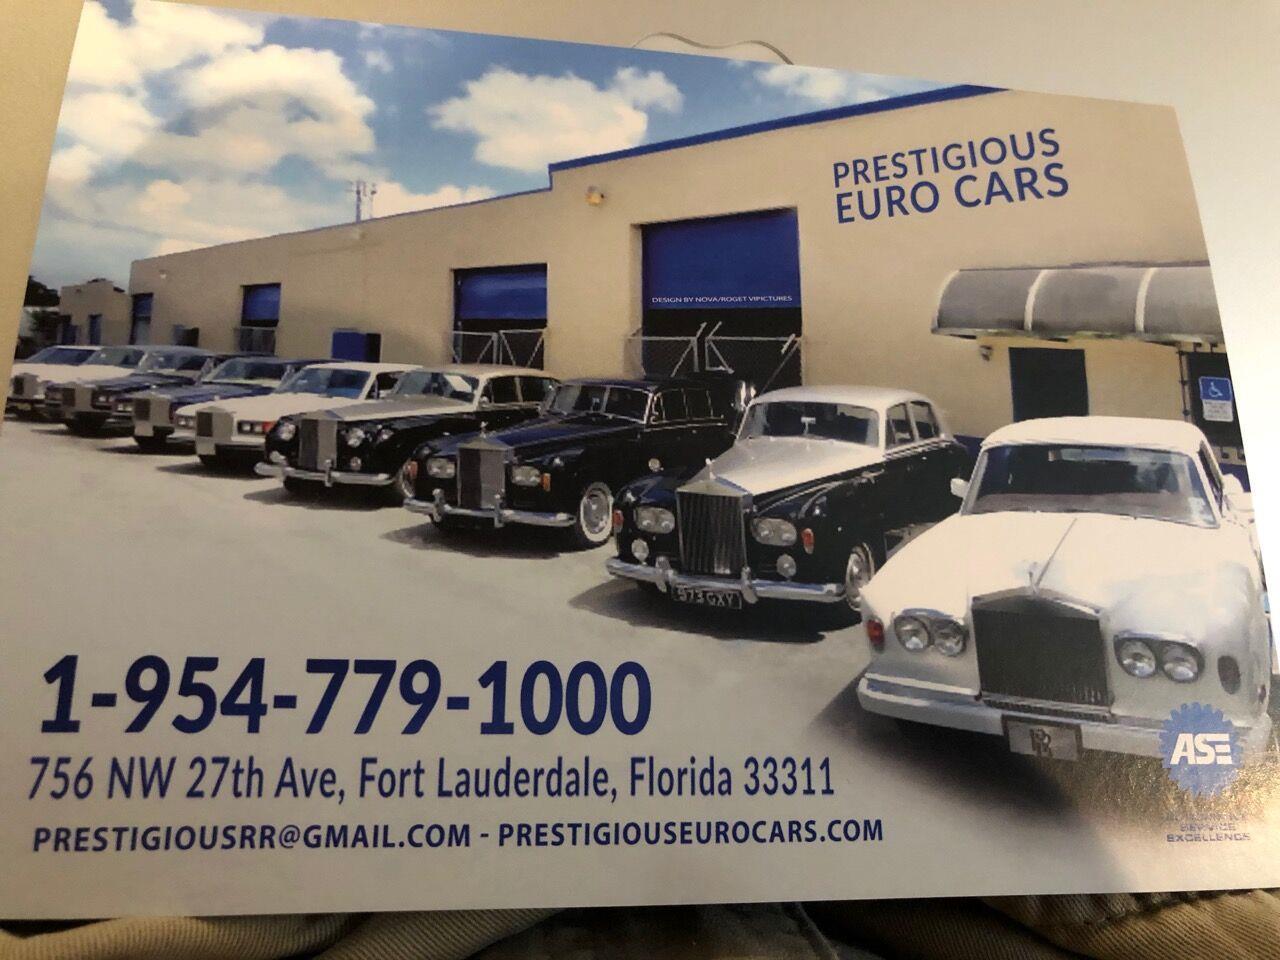 1985 Rolls-Royce Corniche (CC-1149234) for sale in Fort Lauderdale, Florida